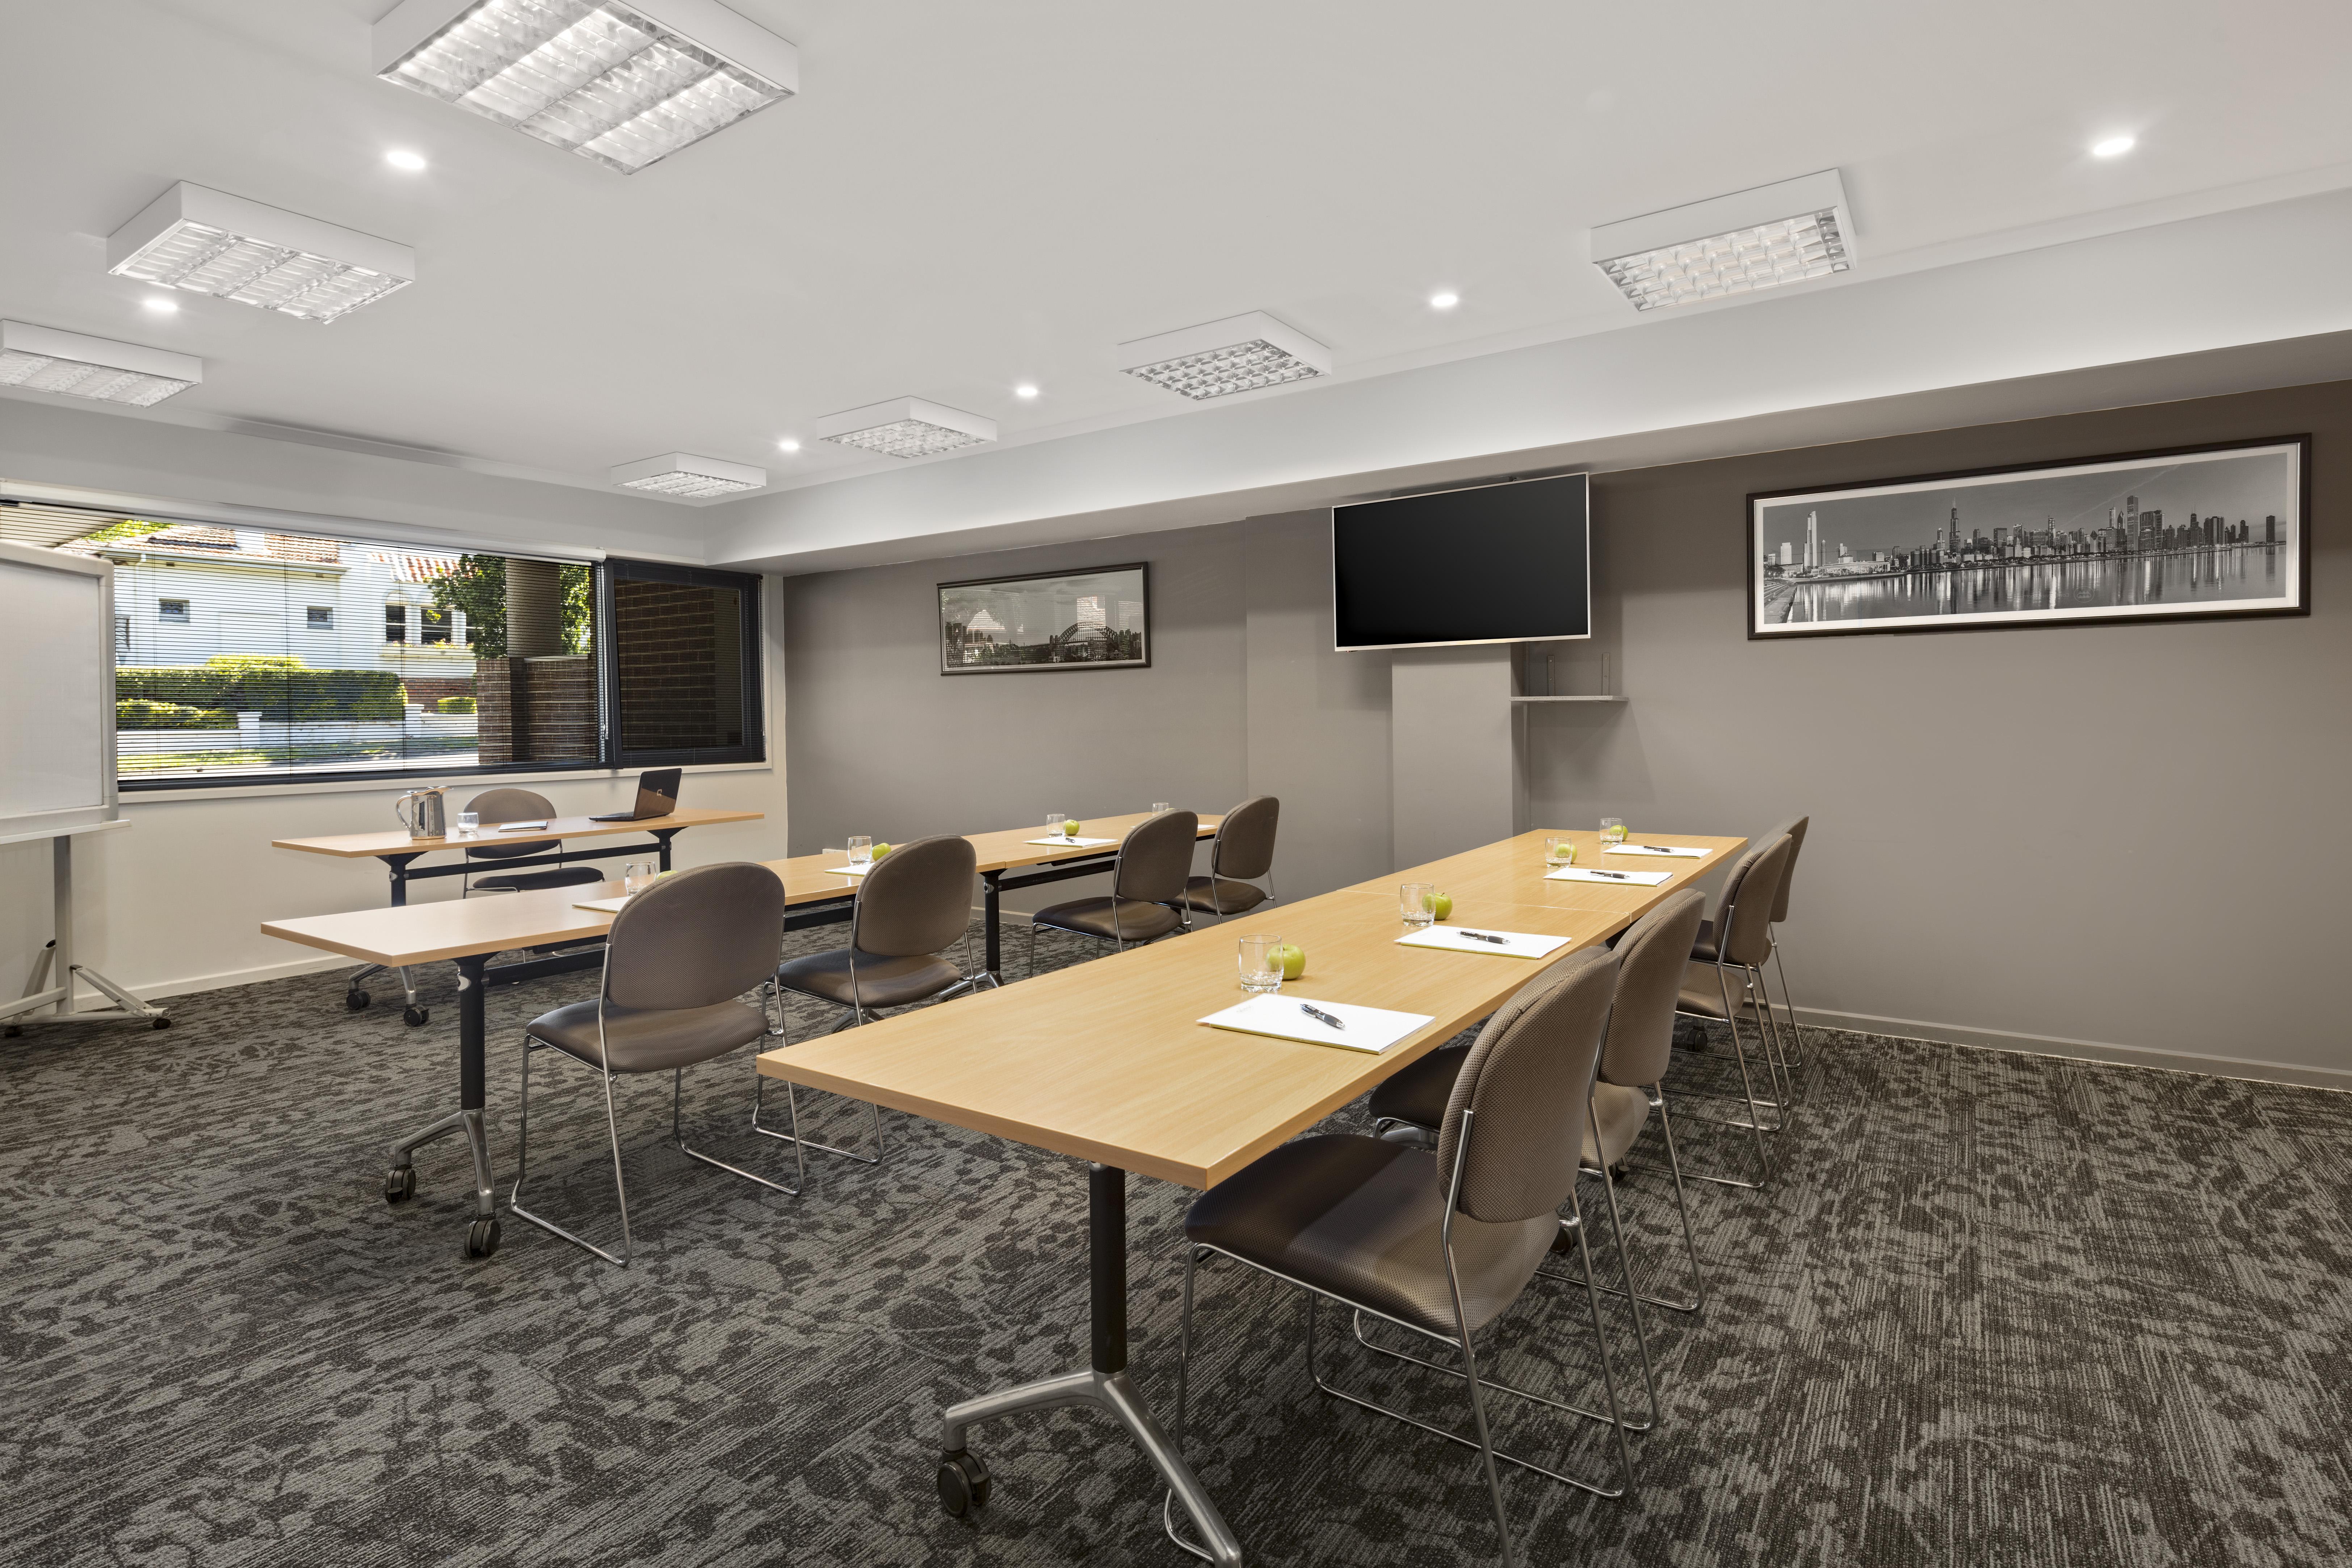 mont albert conference venue mont albert meeting room. Black Bedroom Furniture Sets. Home Design Ideas